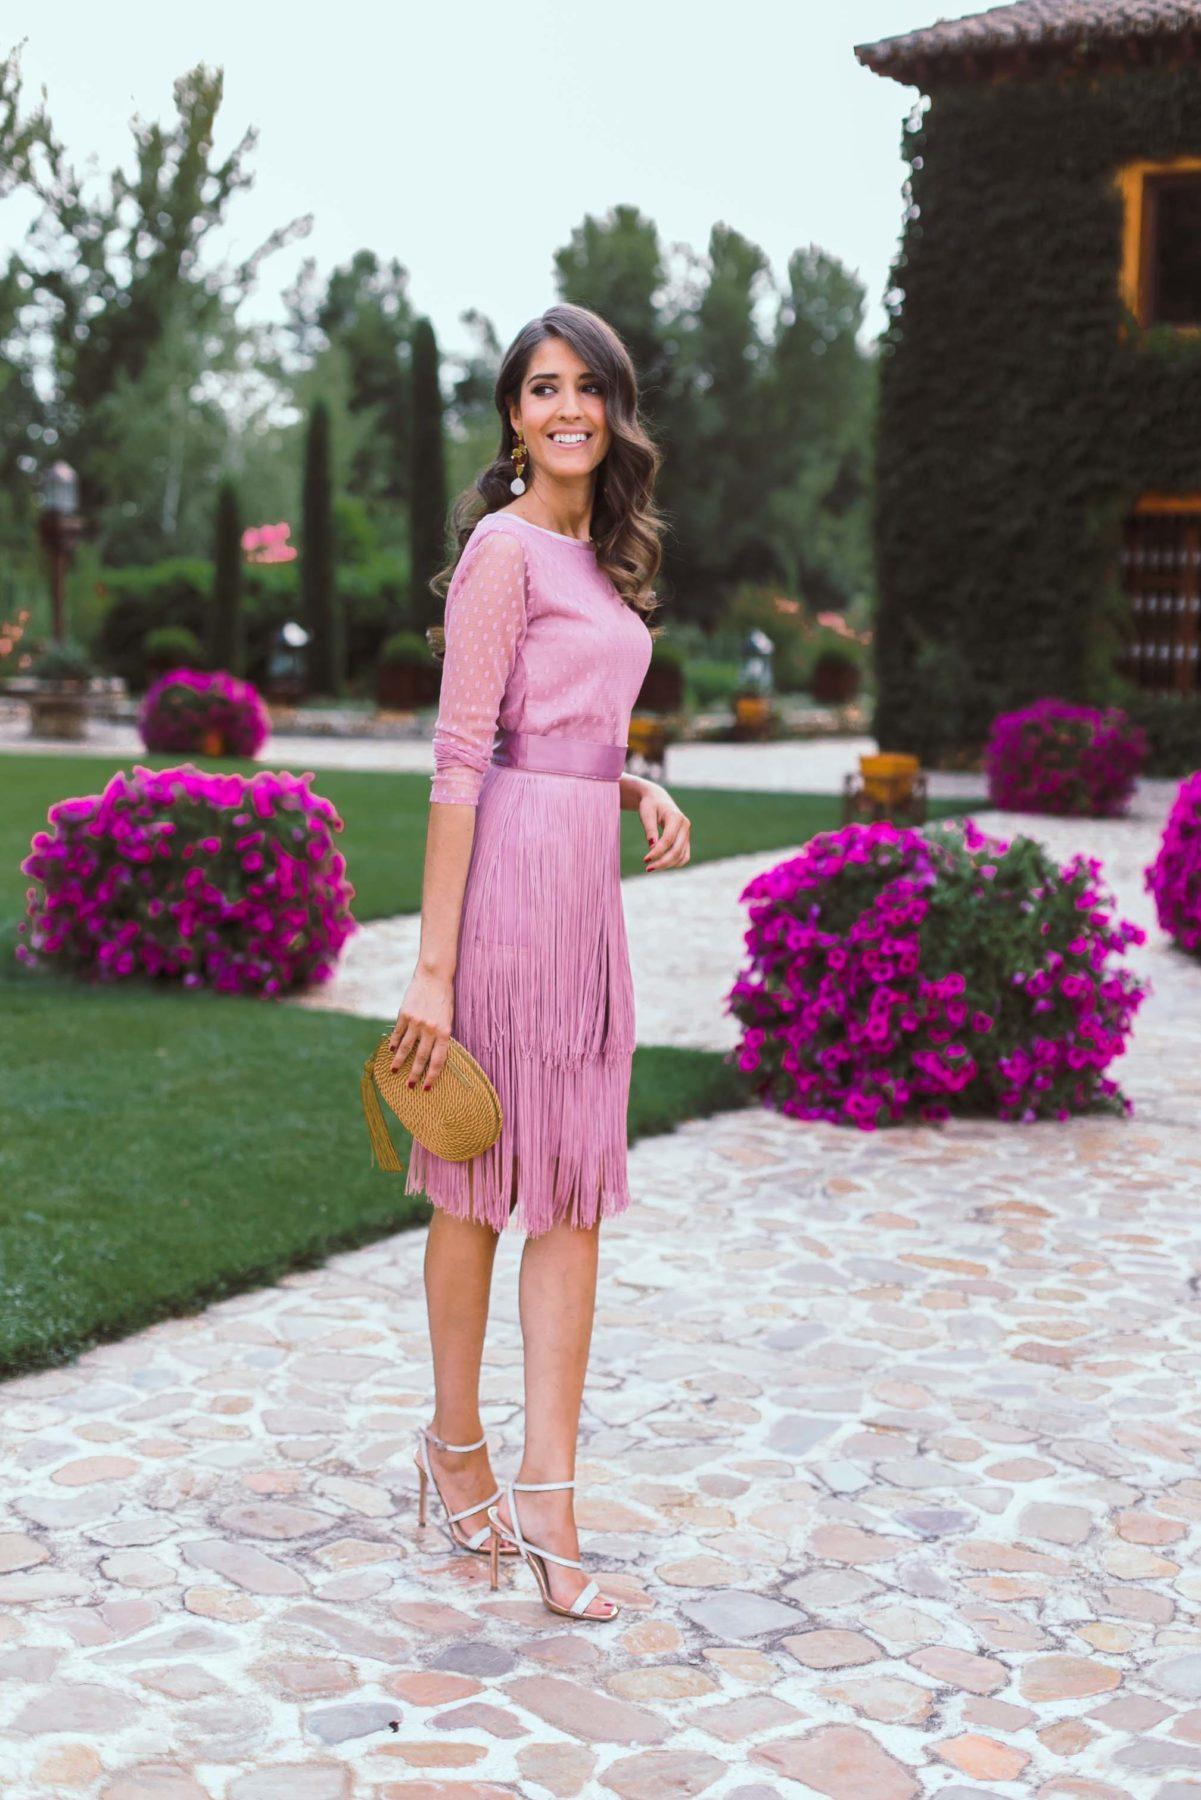 falda con flecos rosa para fiestas de dia o noche